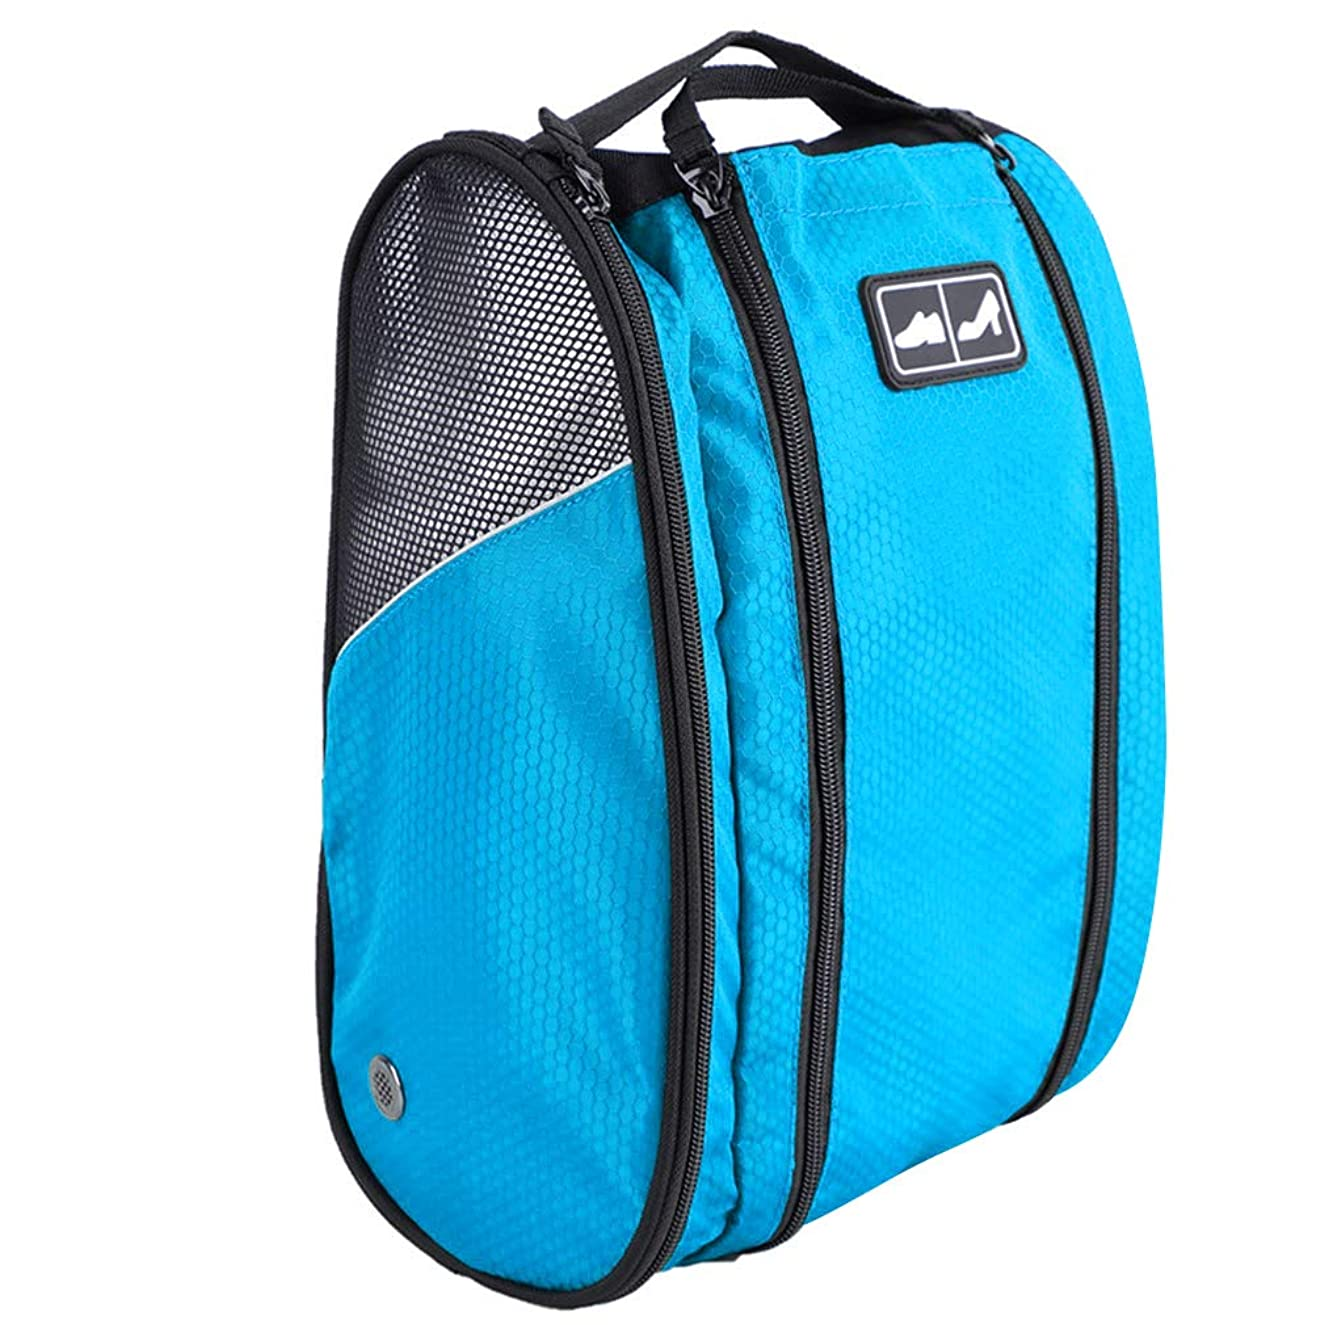 Golf Shoe Bag Travel Sport Gym Yoqa Sock Organizer Odor Resistant Large Zipper Space Shoe's Bag for Men and Women (blue)